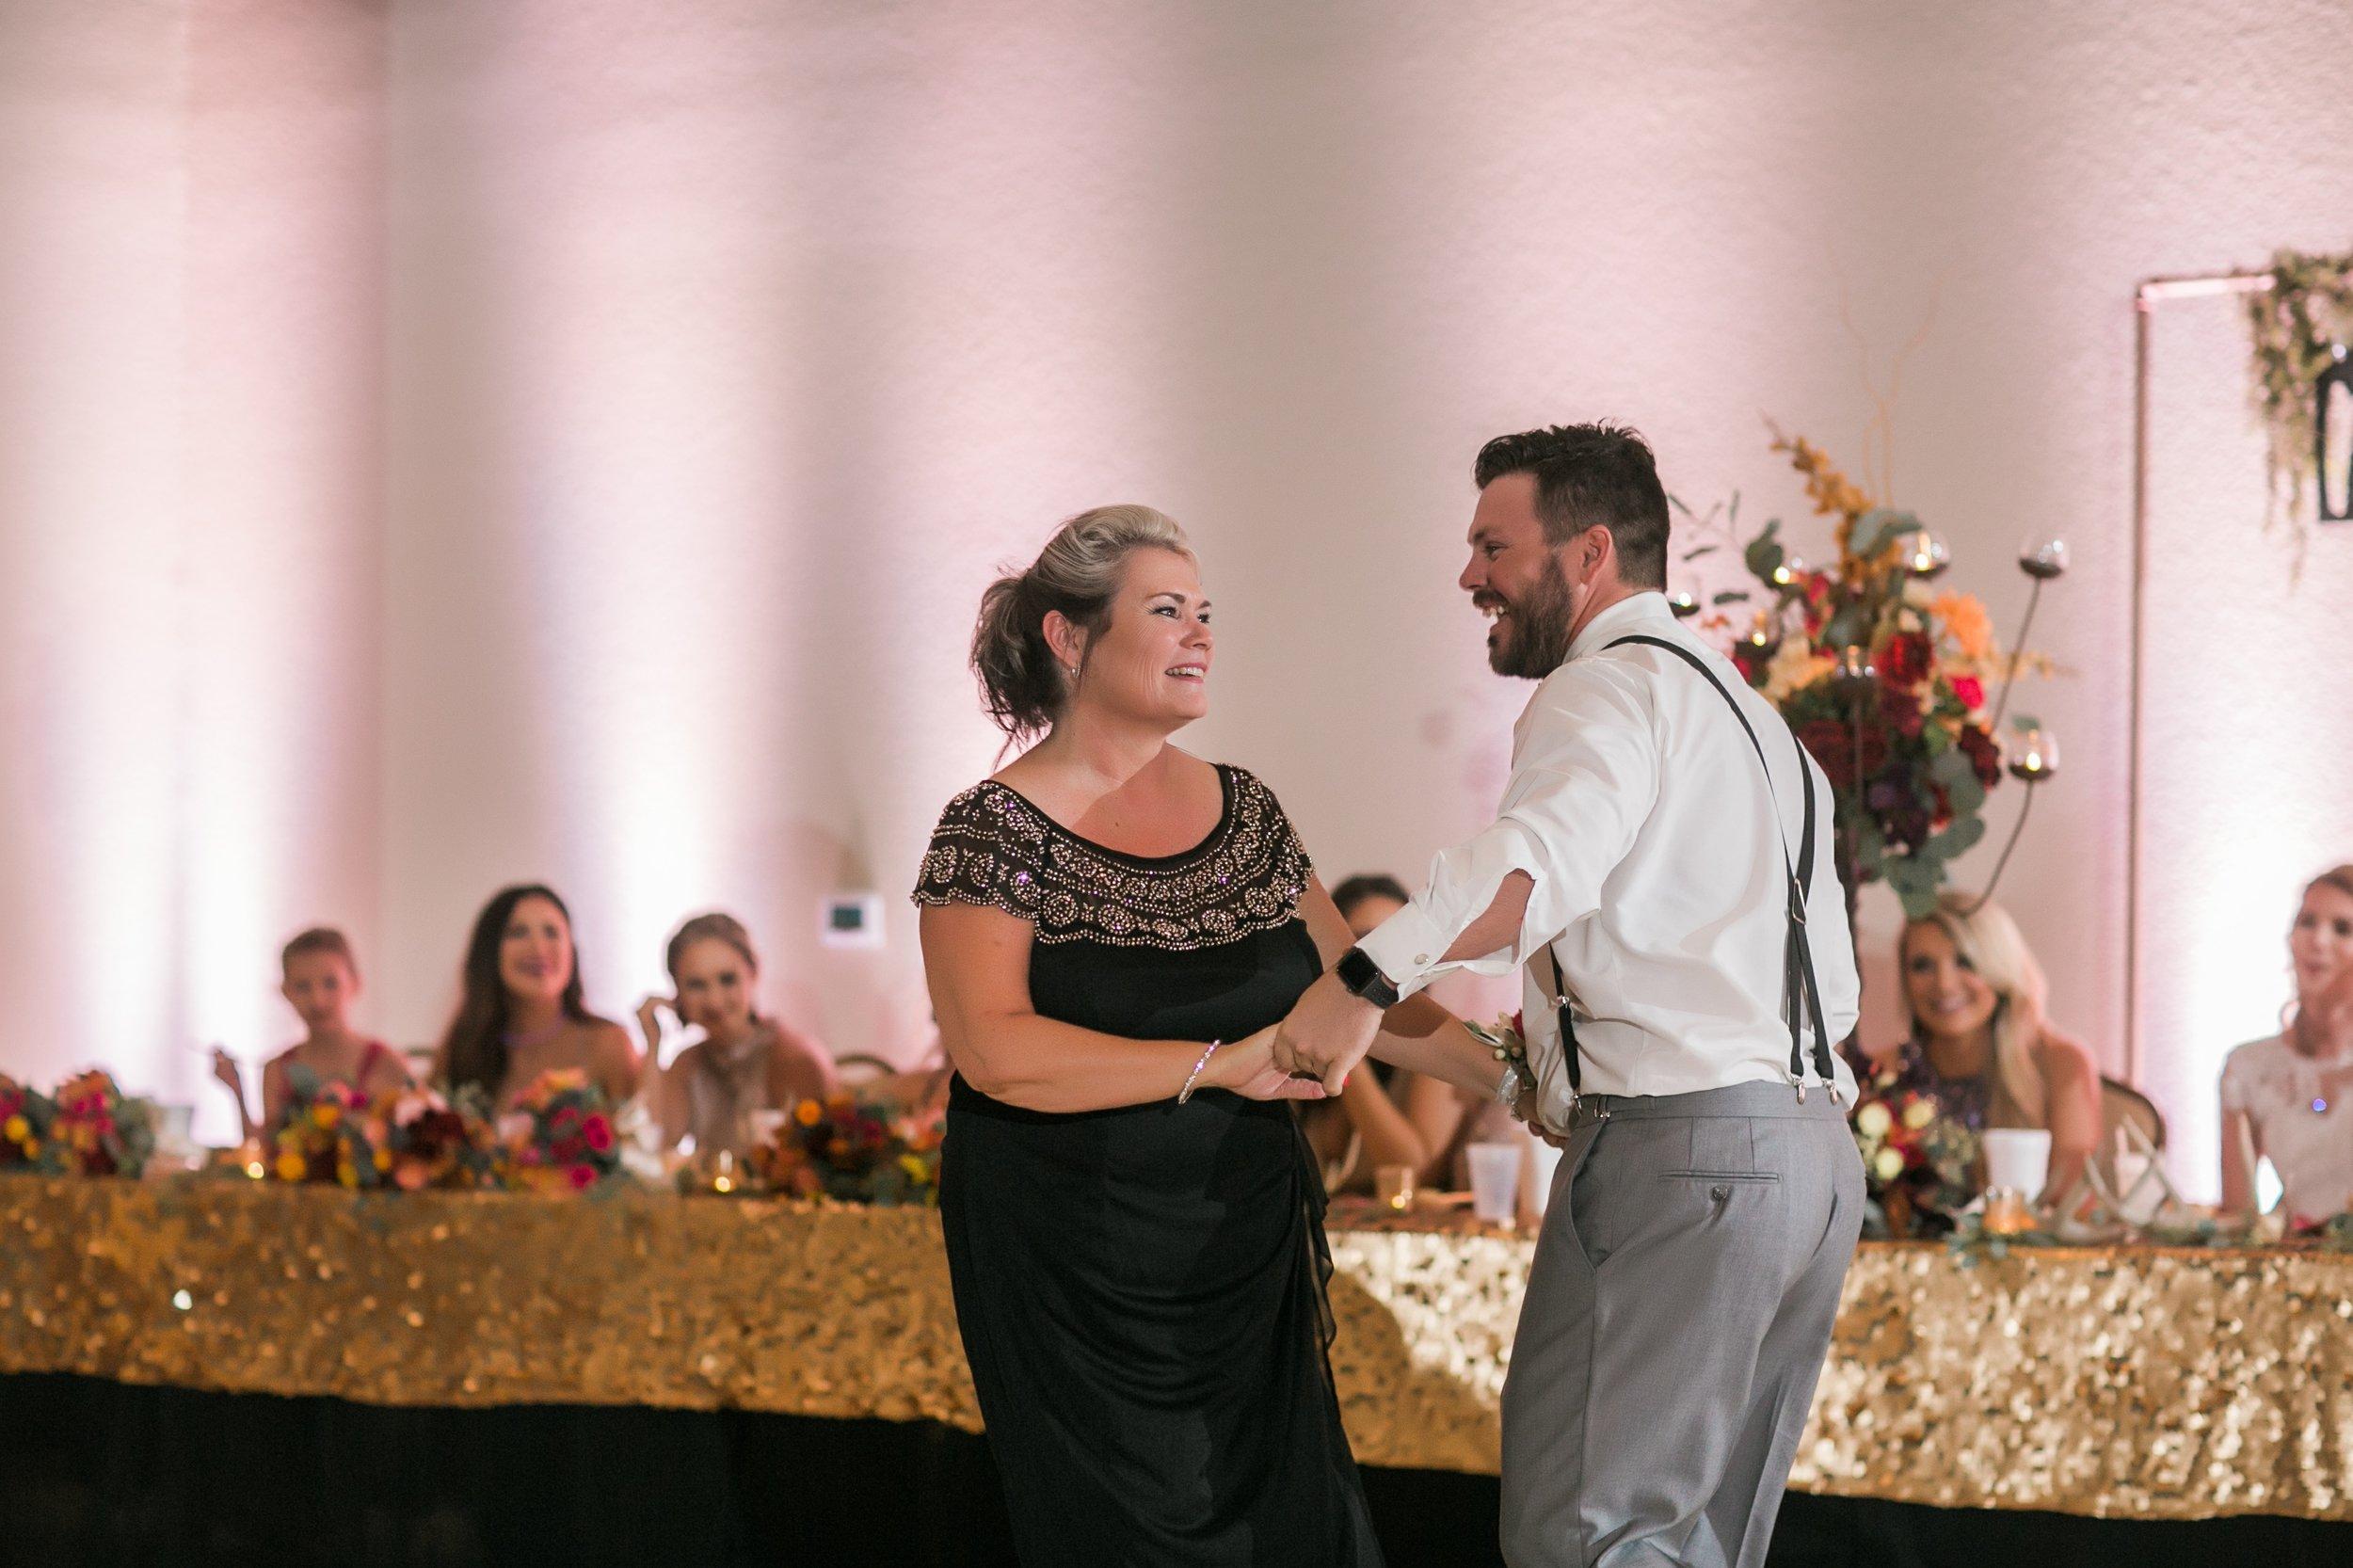 Roberson-Wedding-The-Forum-Lauren-Pinson-Wedding-Photography-Wichita-Falls-Texas-083.jpg